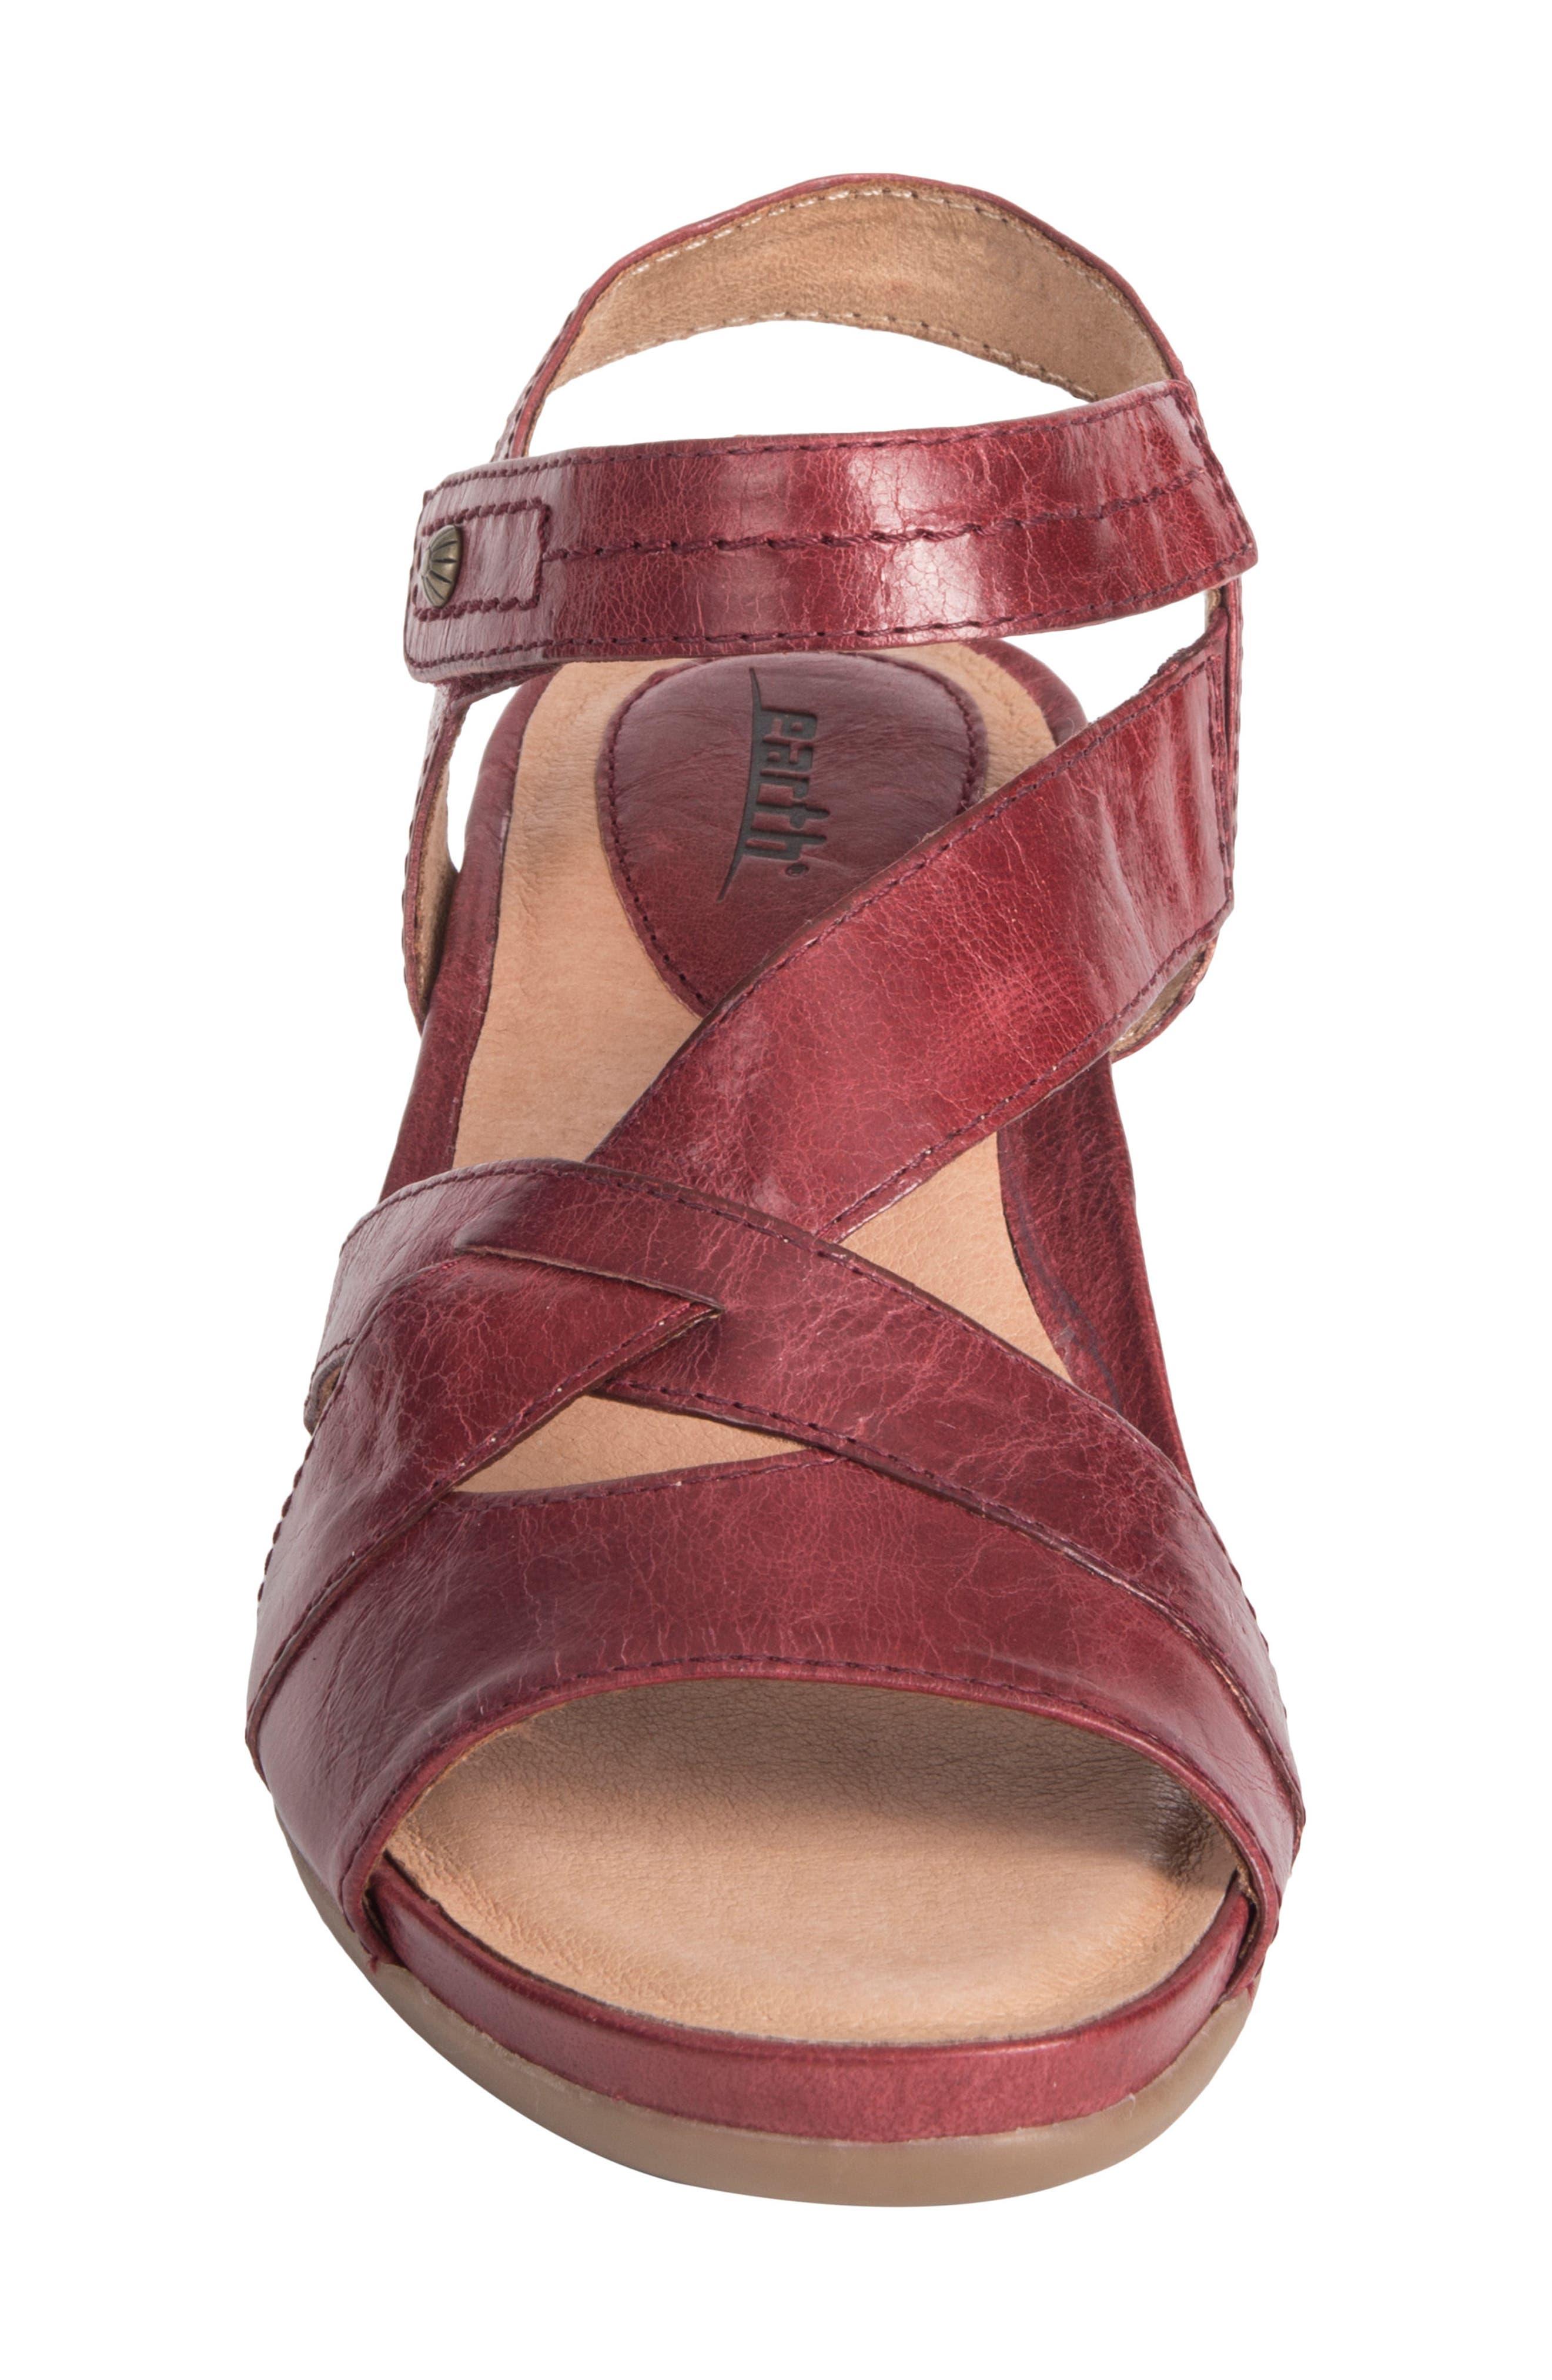 Thistle Wedge Sandal,                             Alternate thumbnail 15, color,